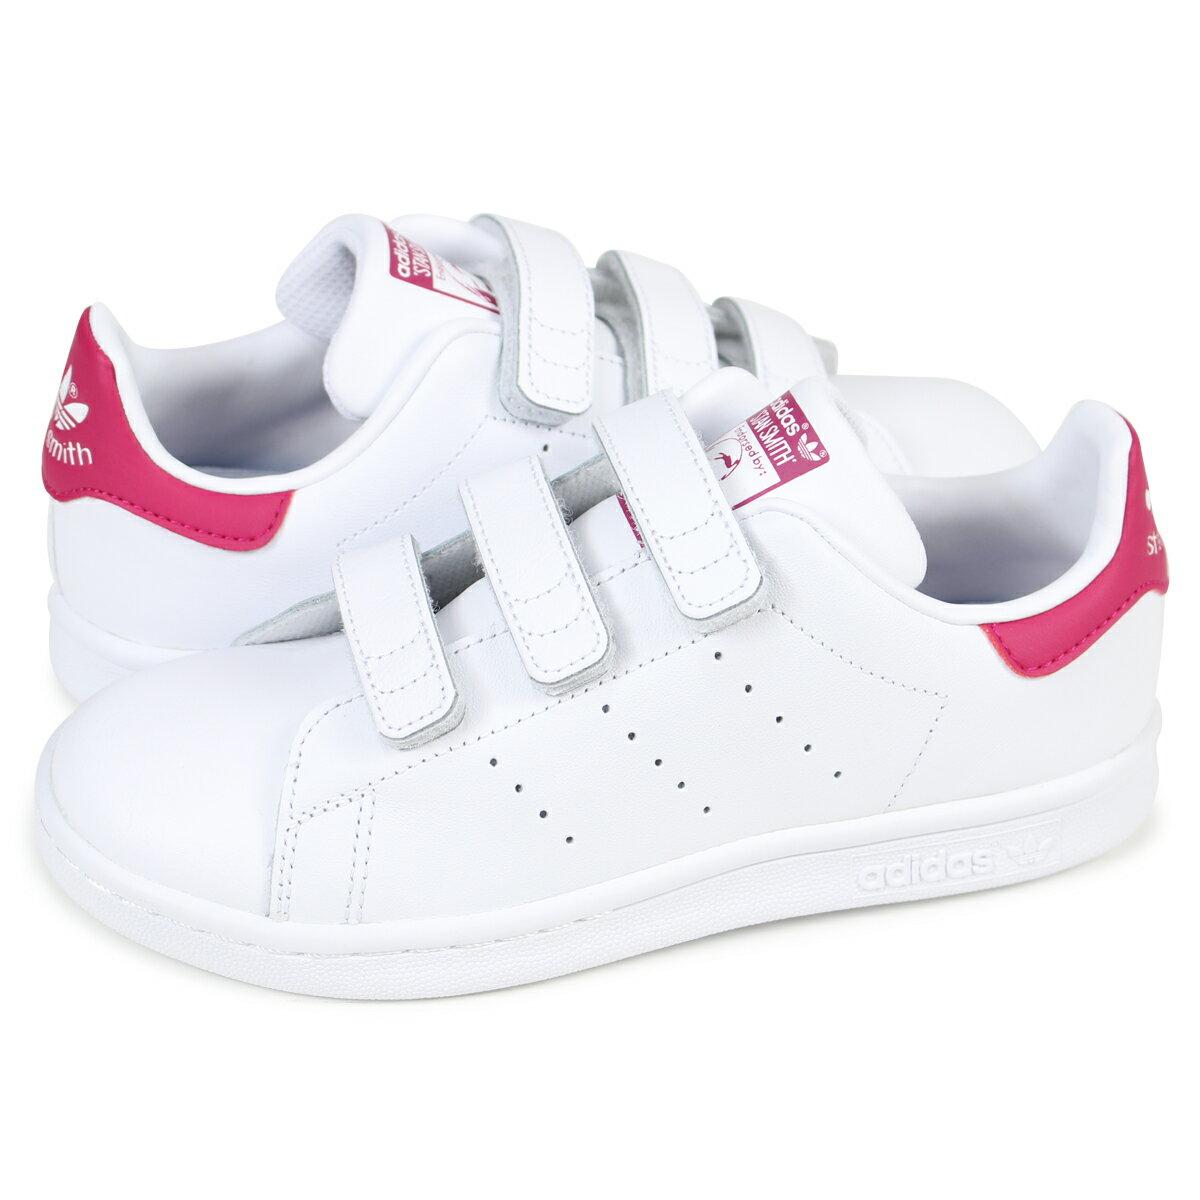 adidas Originals STAN SMITH CF C スタンスミス キッズ アディダス スニーカー B32706 靴 ホワイト 【決算セール】